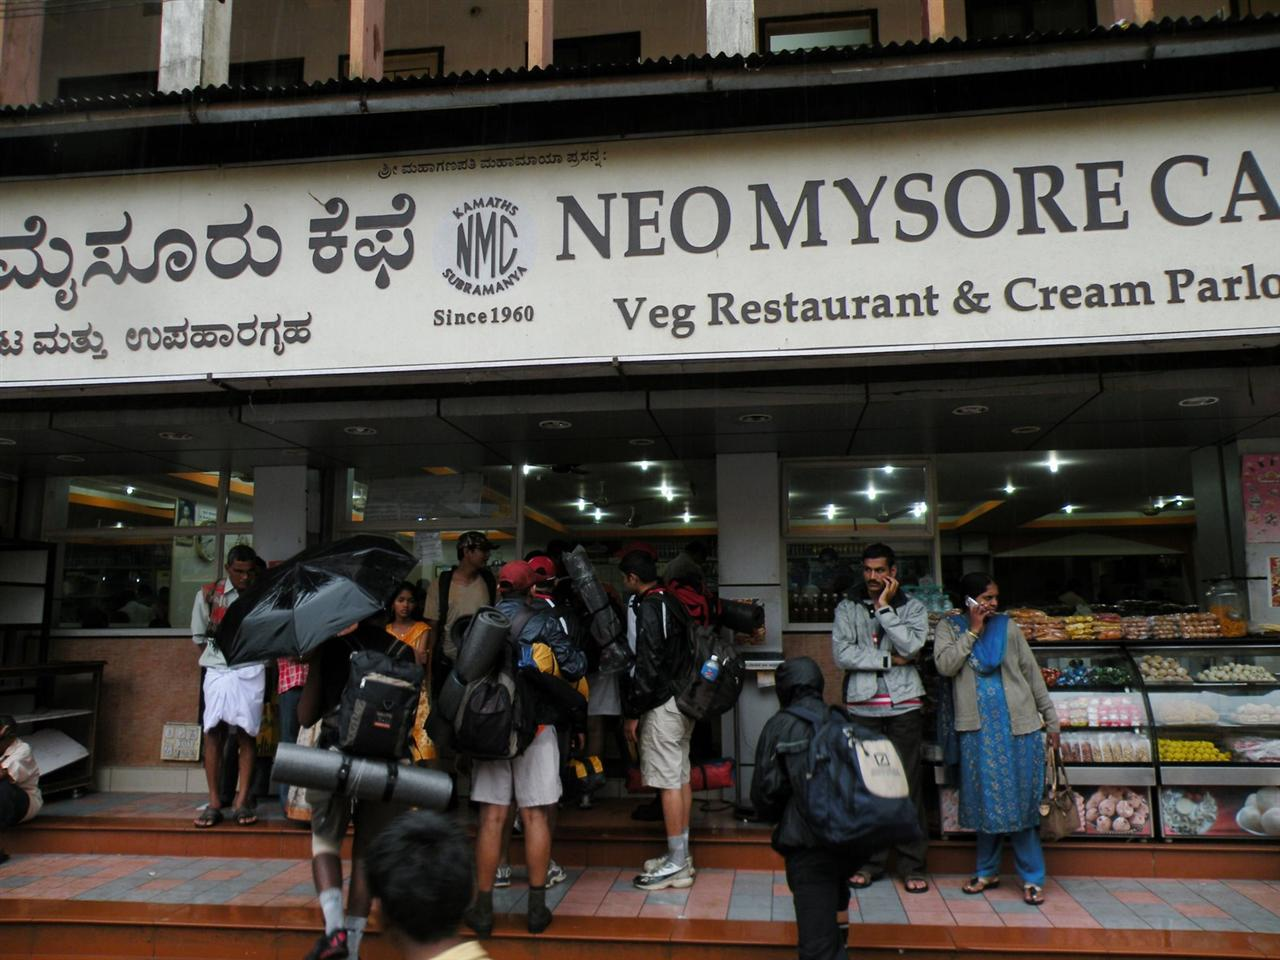 Neo Mysore cafe-Good restaurant